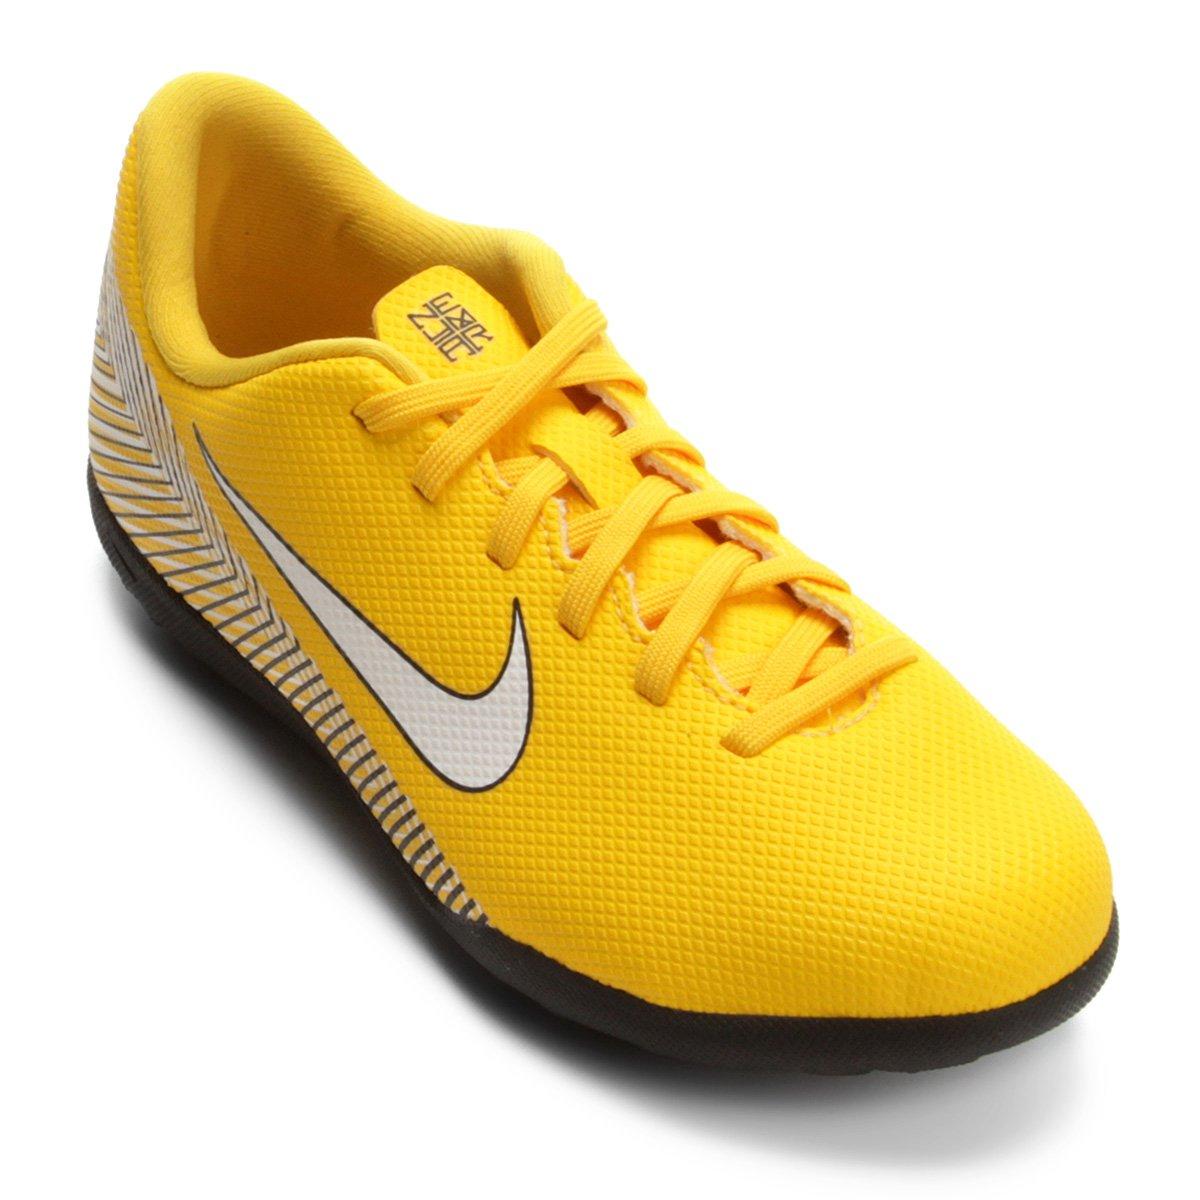 c8a0113ed64f2 Chuteira Society Infantil Nike Mercurial Vapor 12 Club GS Neymar TF | Shop  Timão